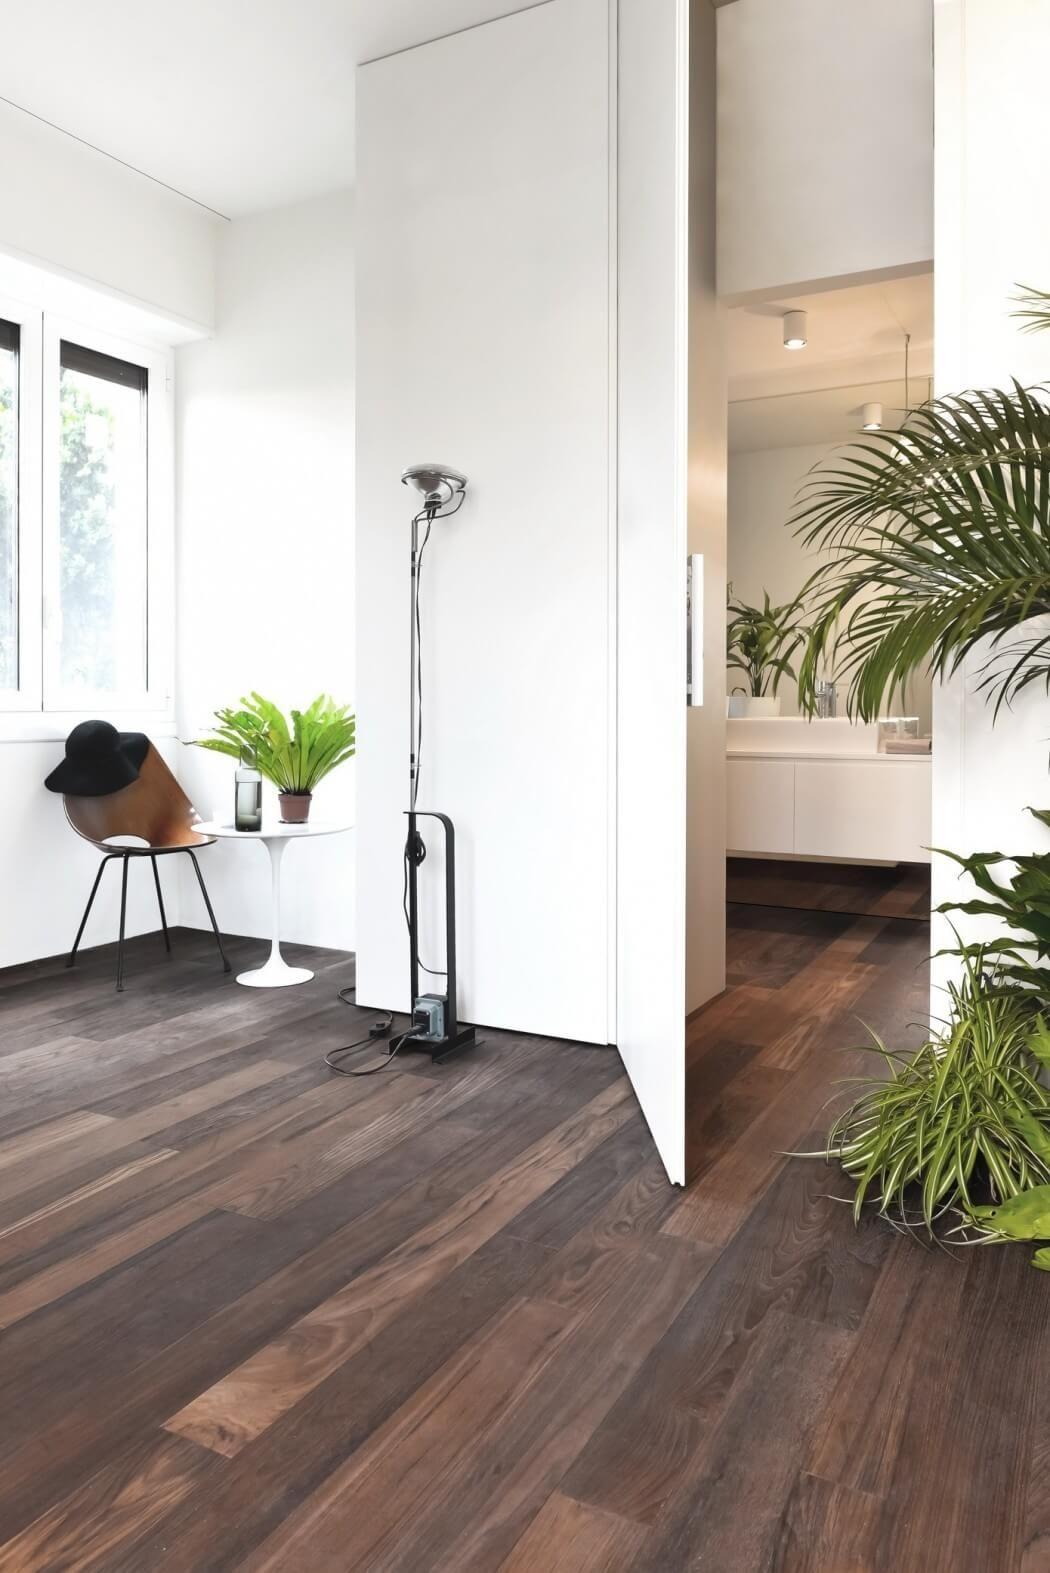 Italian Apartment Thinks Inside The Box Modern ApartmentsMilan ItalyHouse